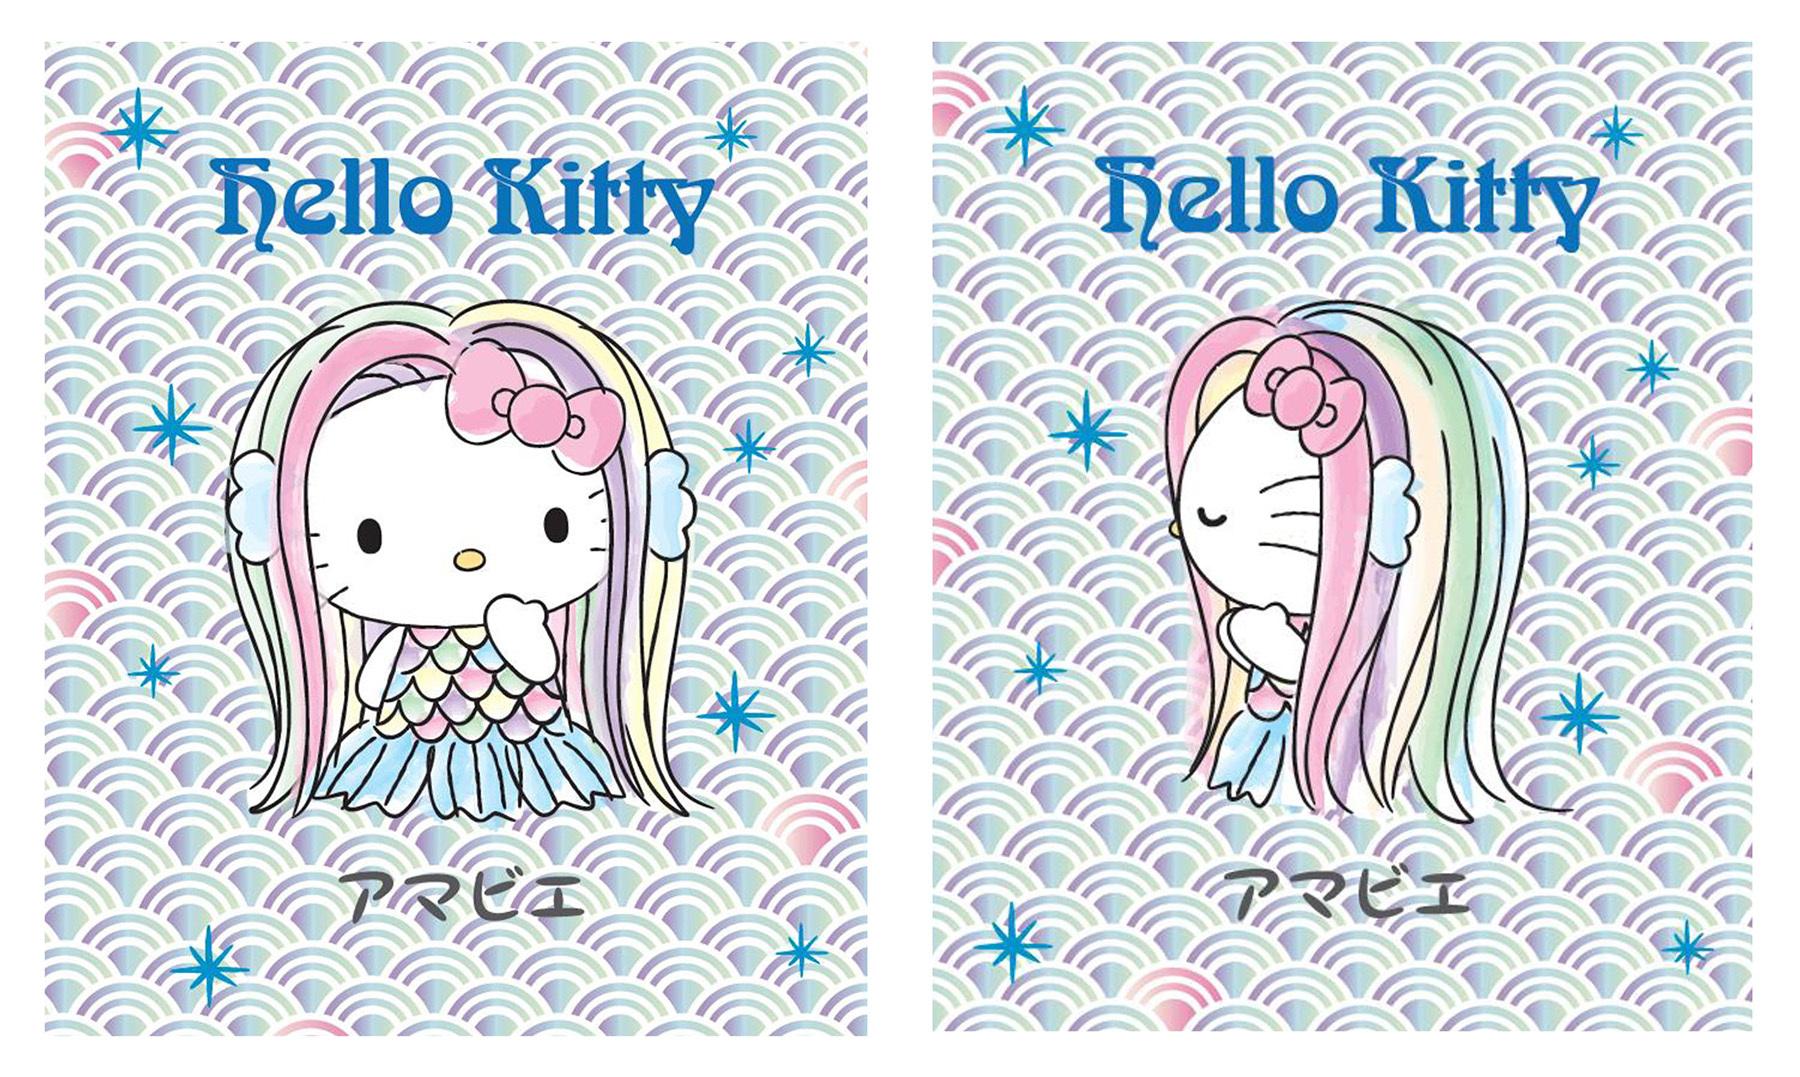 Hello Kitty_阿玛比埃联动商品_和邪社01